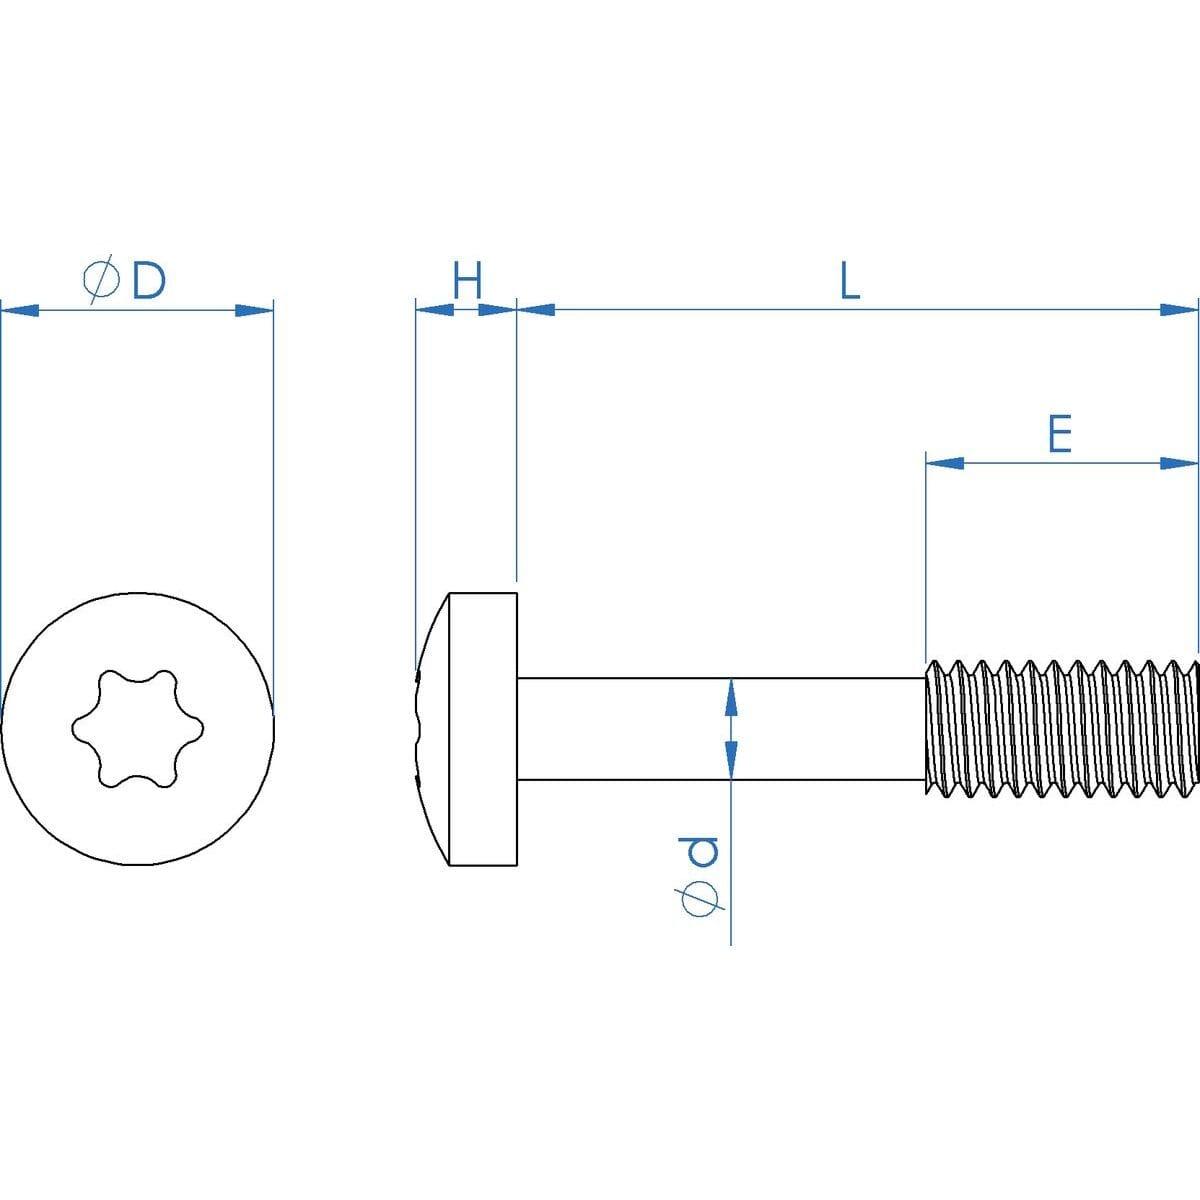 M6 x 35mm Torx Pan Head Captive Screws (DIN 7985) - Thread Locking Stainless Steel (A2) Drawing